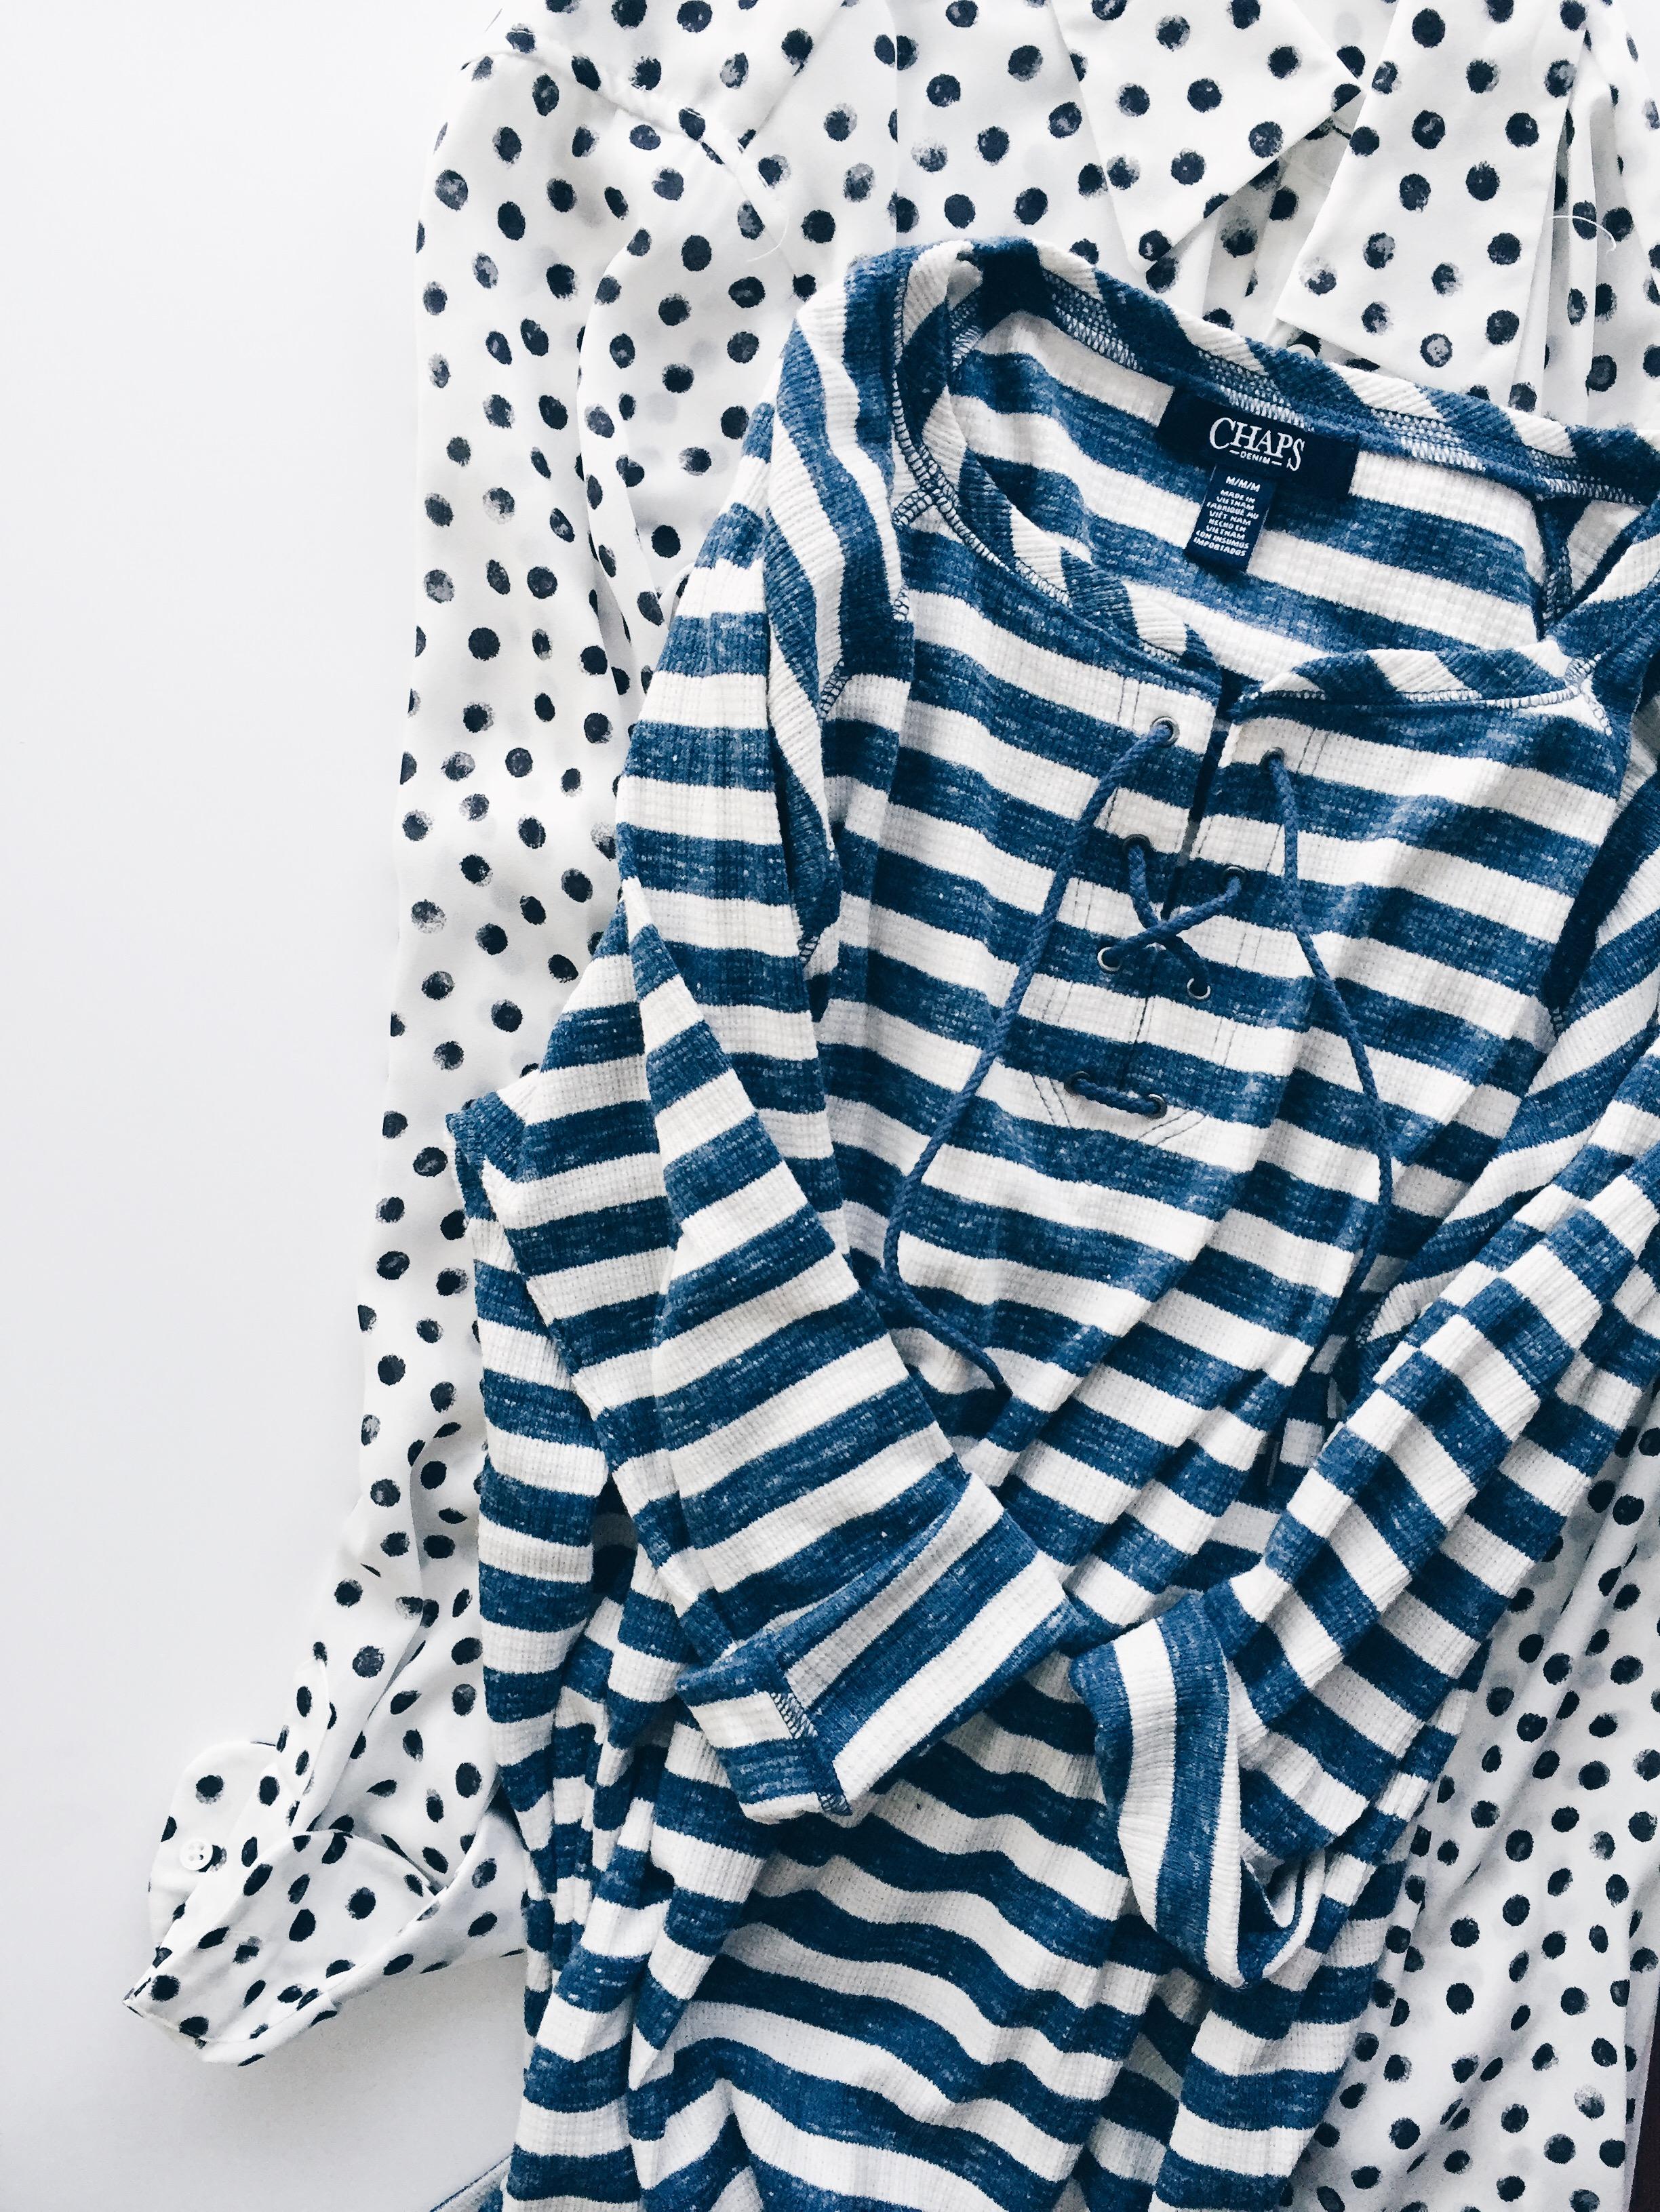 TIP: stripes and polka dots go together like PB&J.